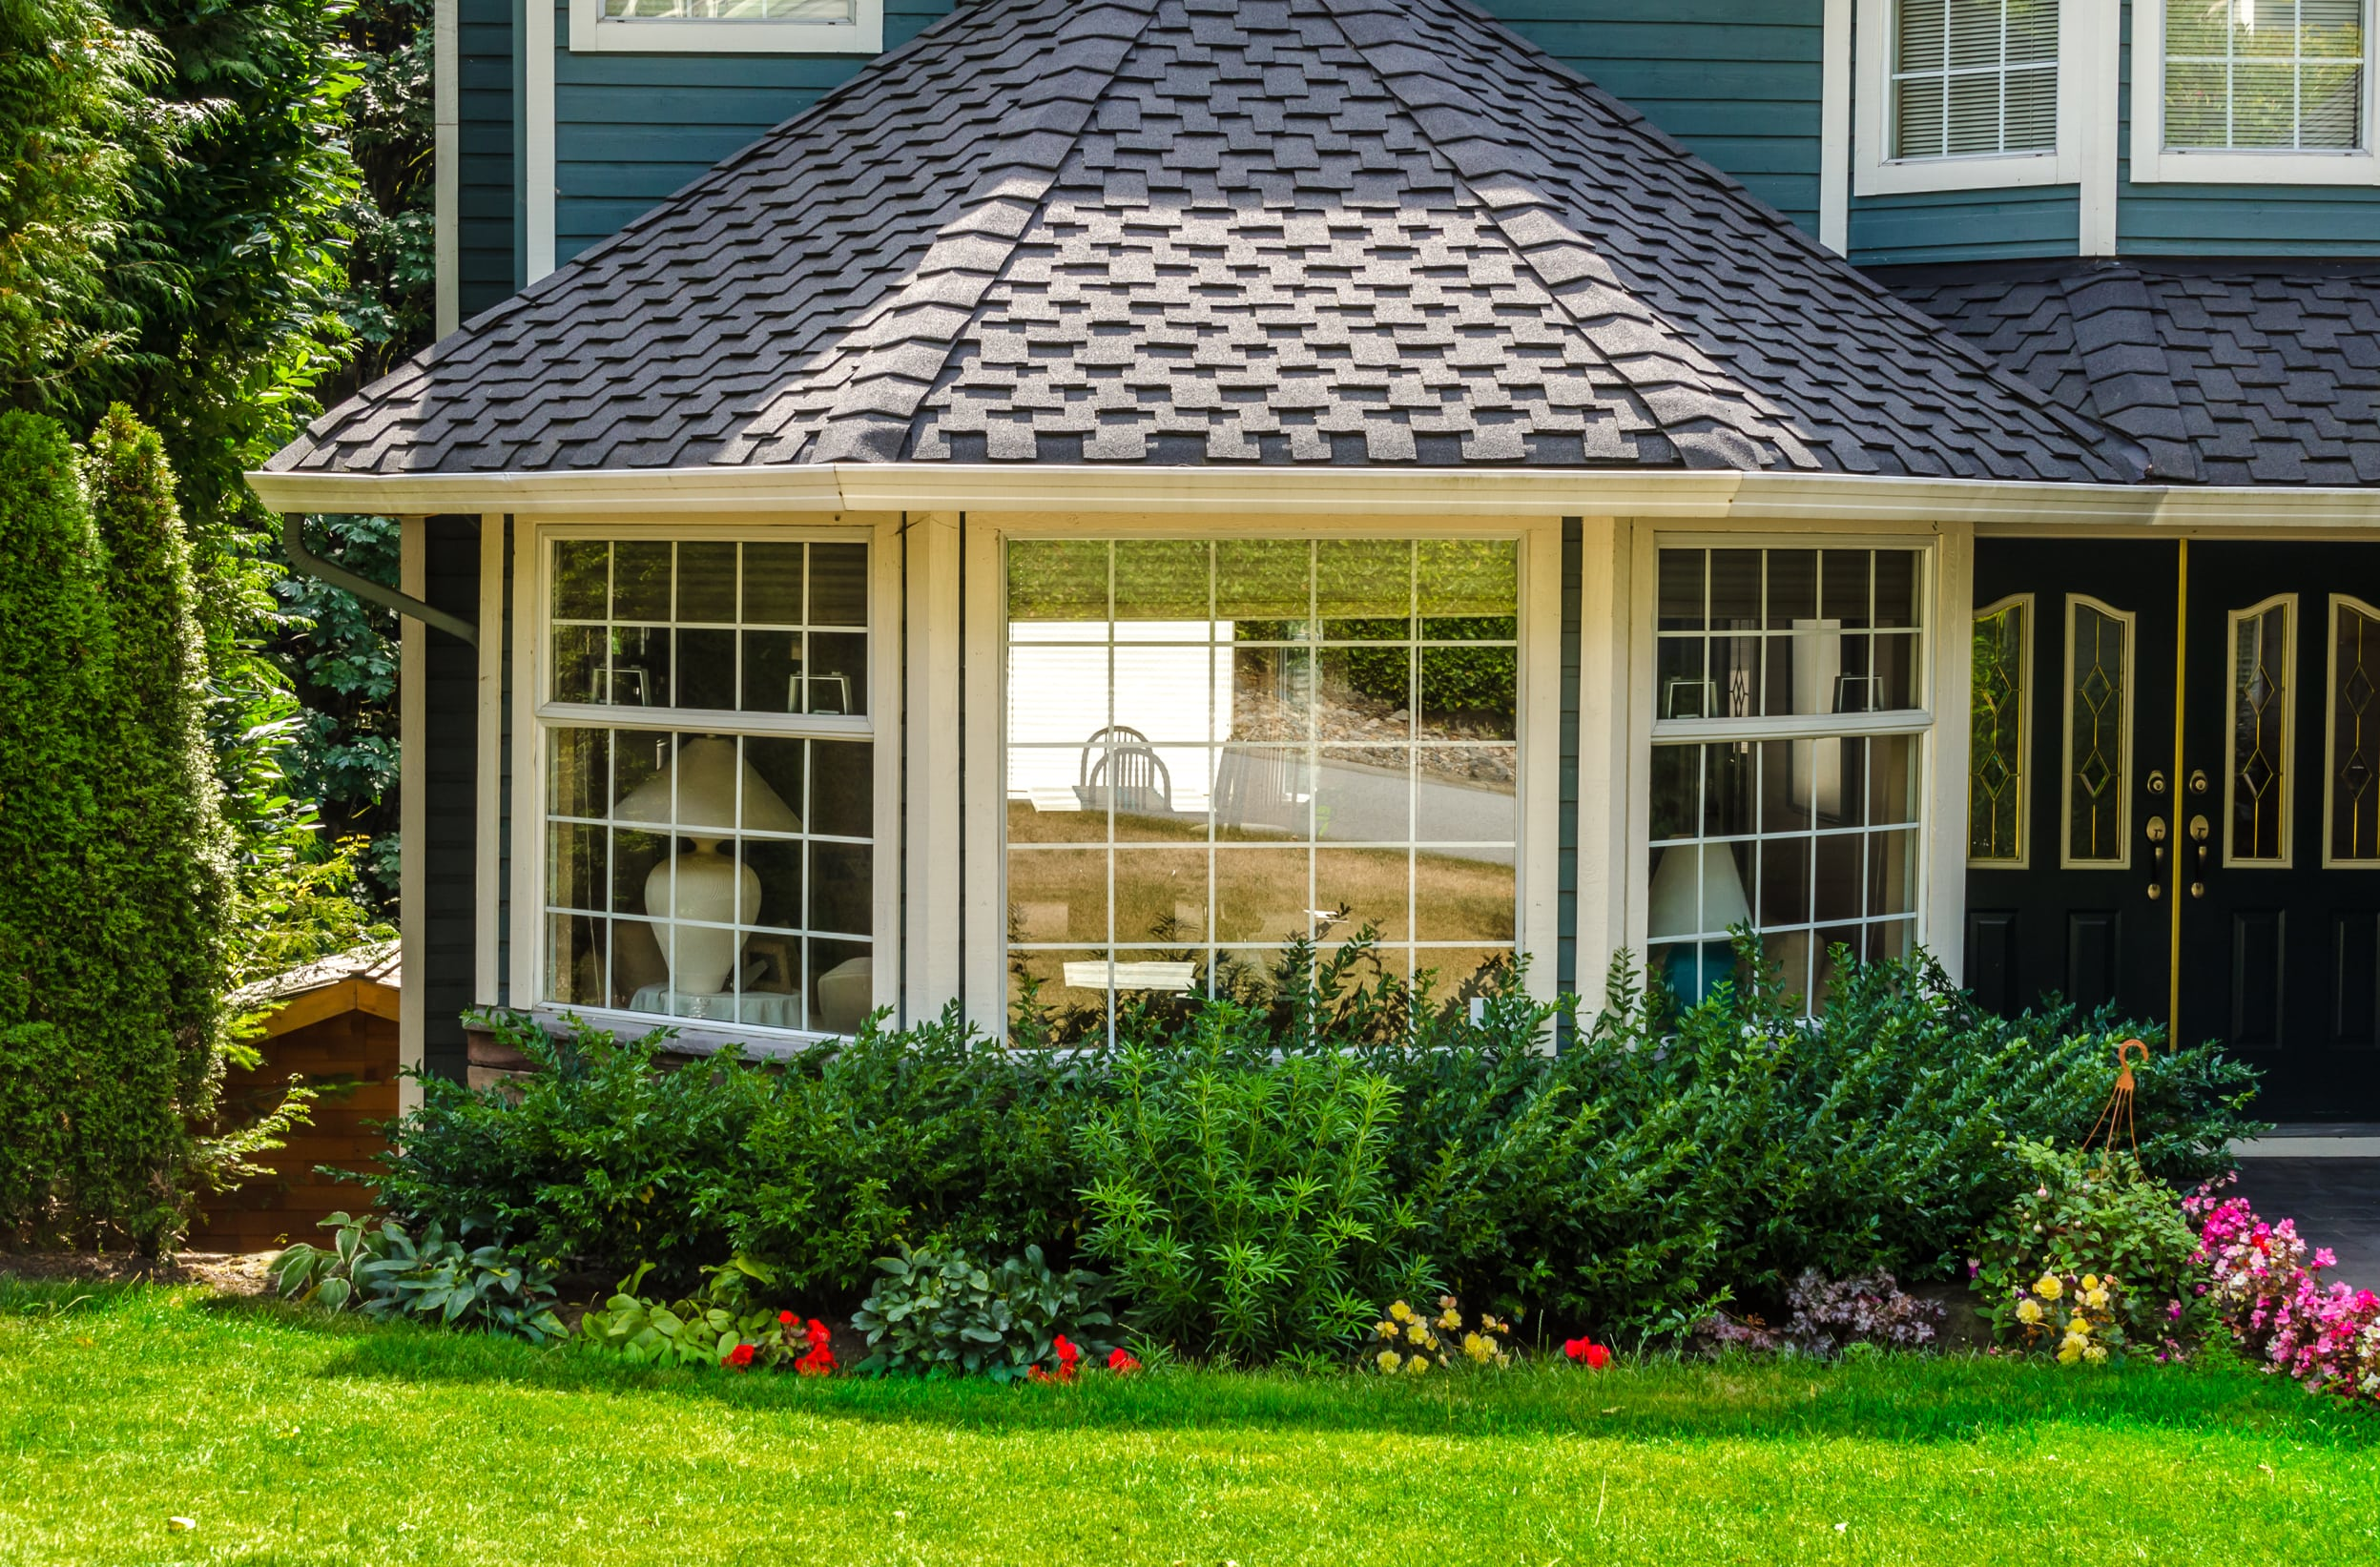 Alma Porras Real Estate Services image 5